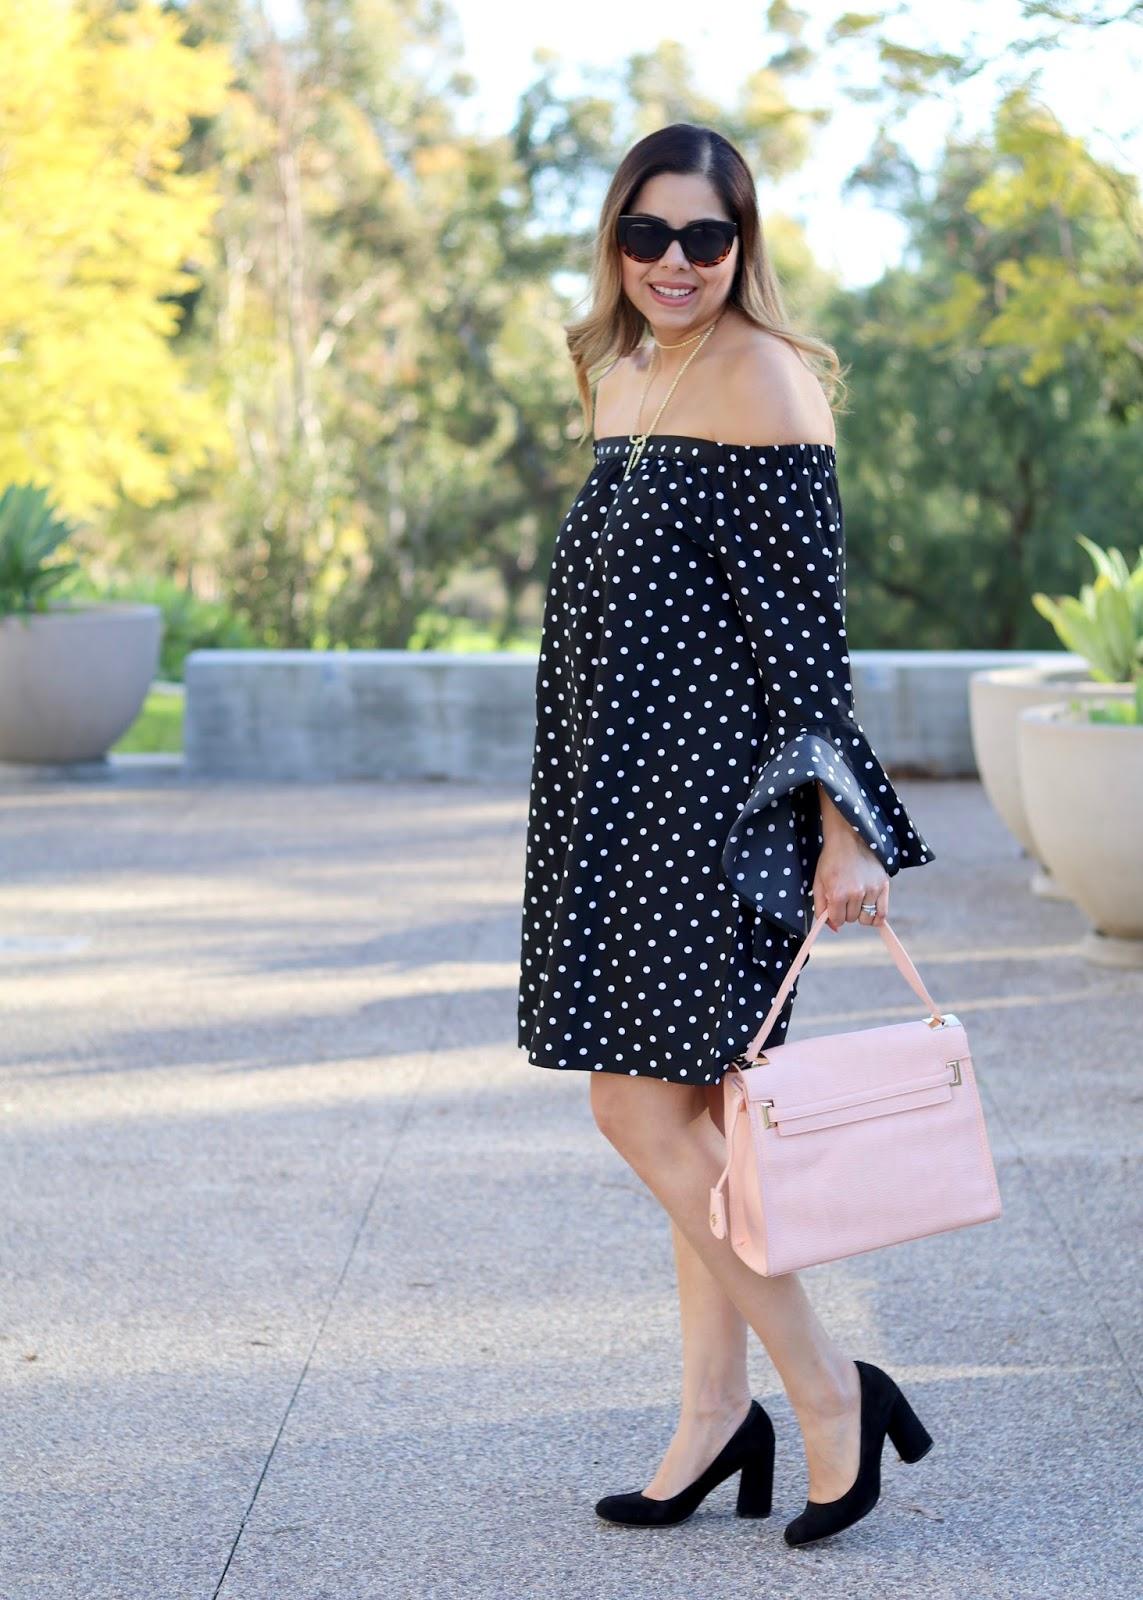 ASOS dress, ASOS blogger, Affordable cute dresses